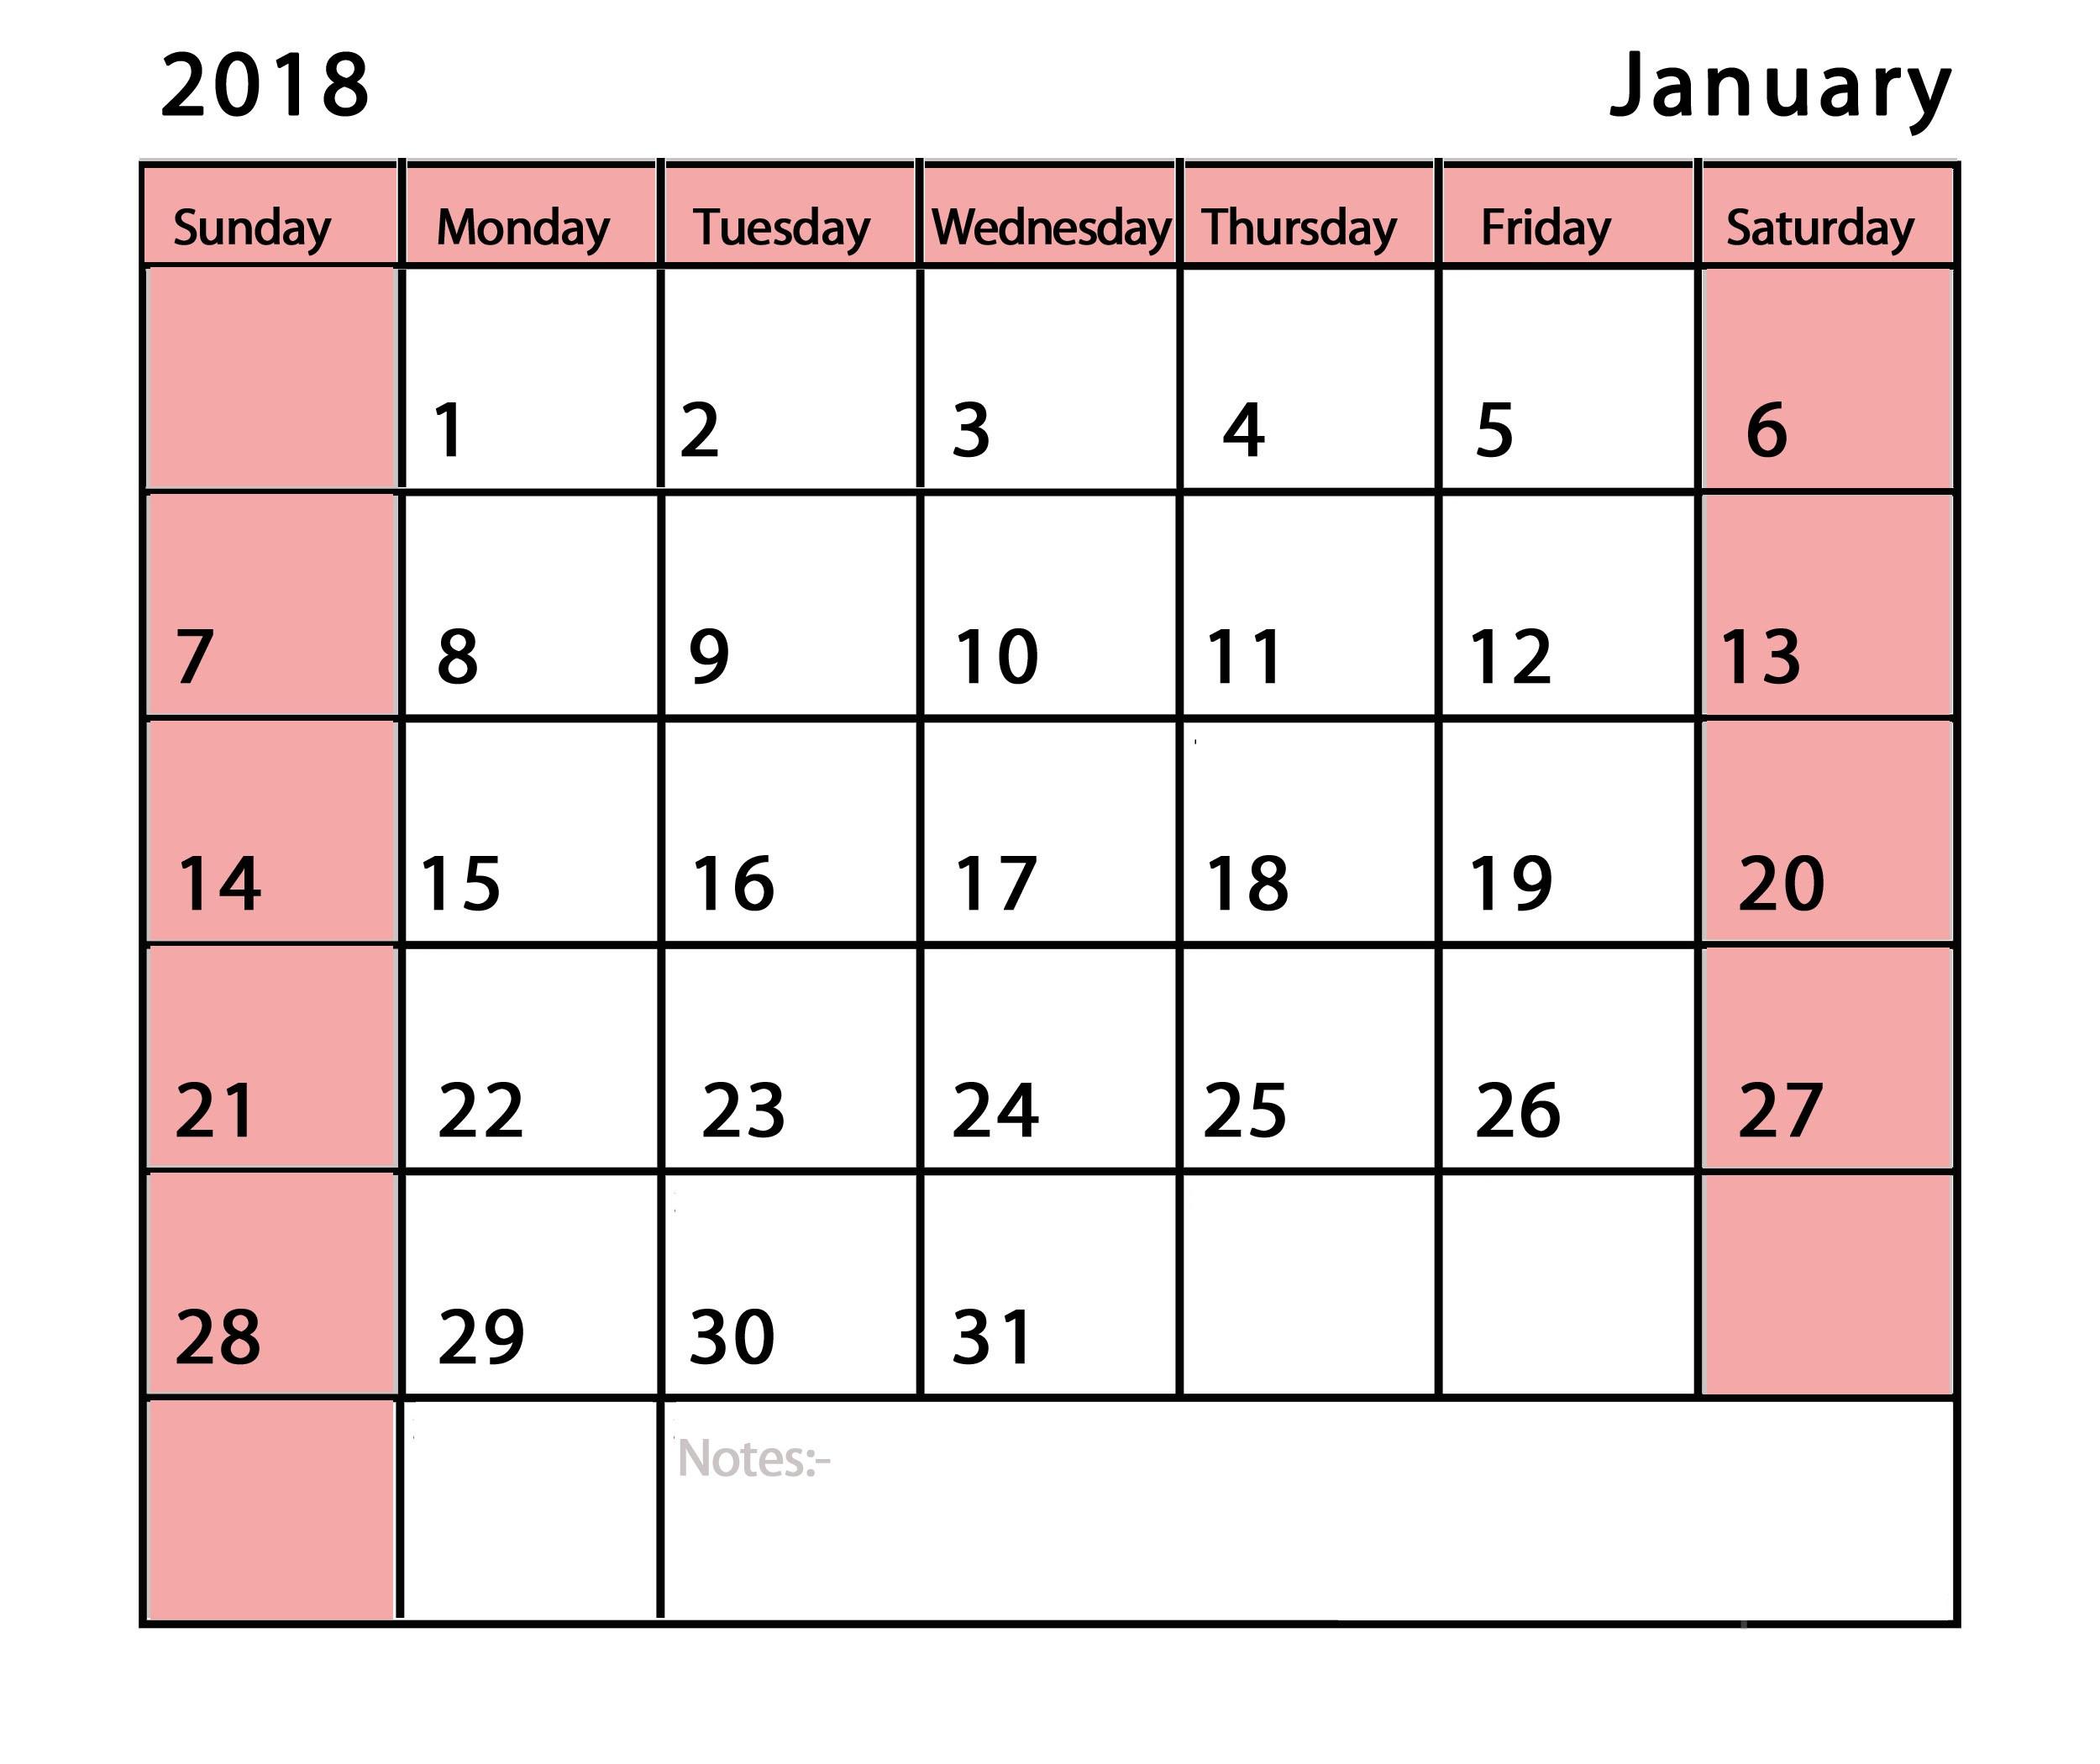 January 2018 Calendar Printable Pdf Template Latest 2500x2100